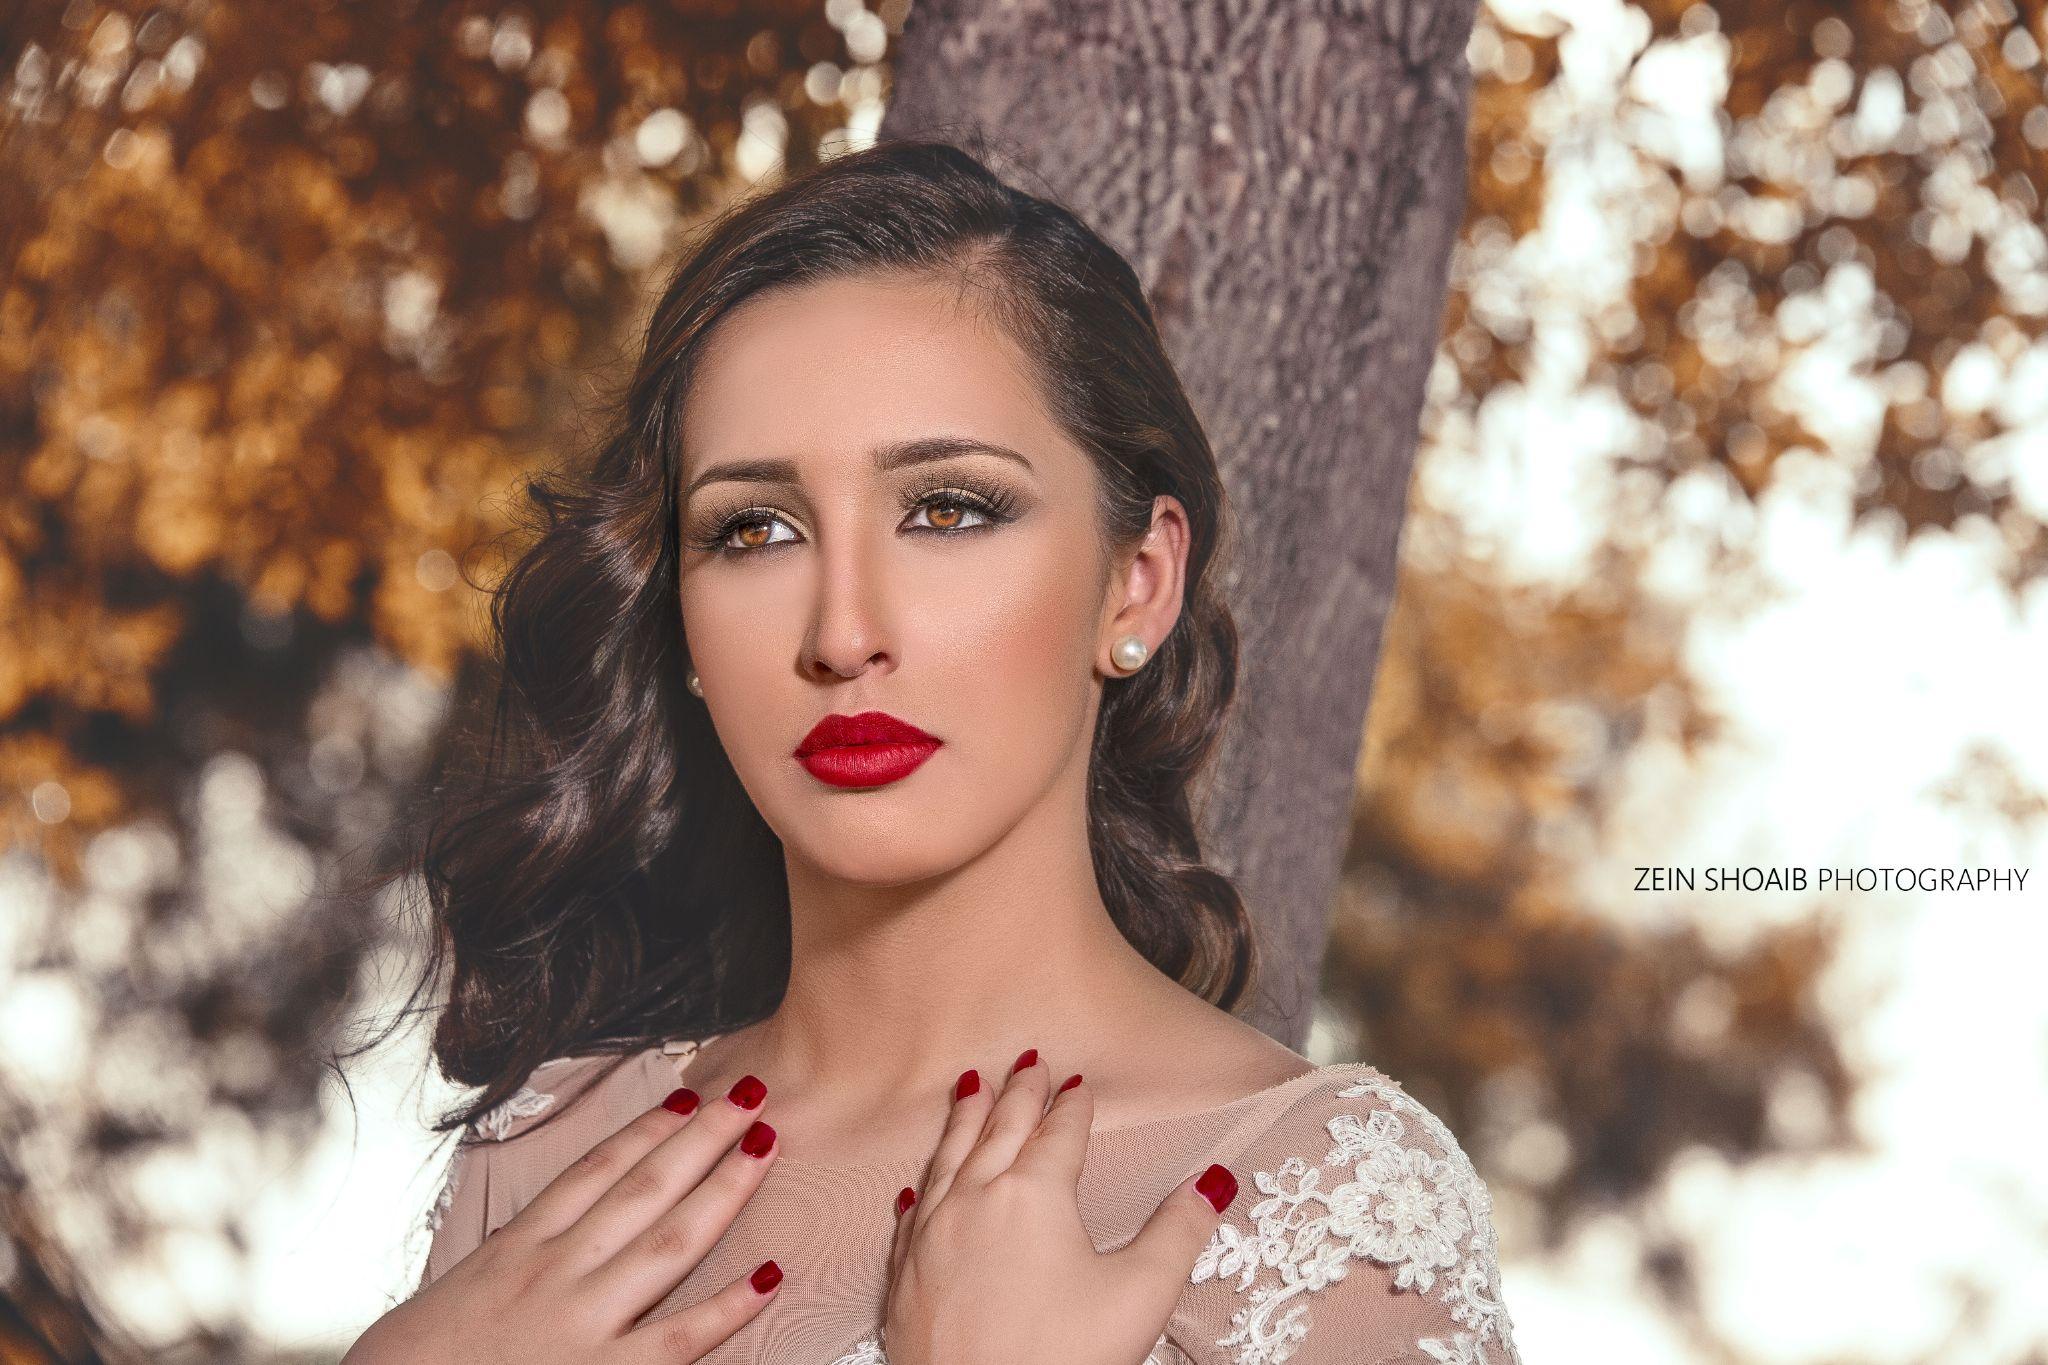 Zein Shoaib Photography by Zein cheaib (DSLRNATION)